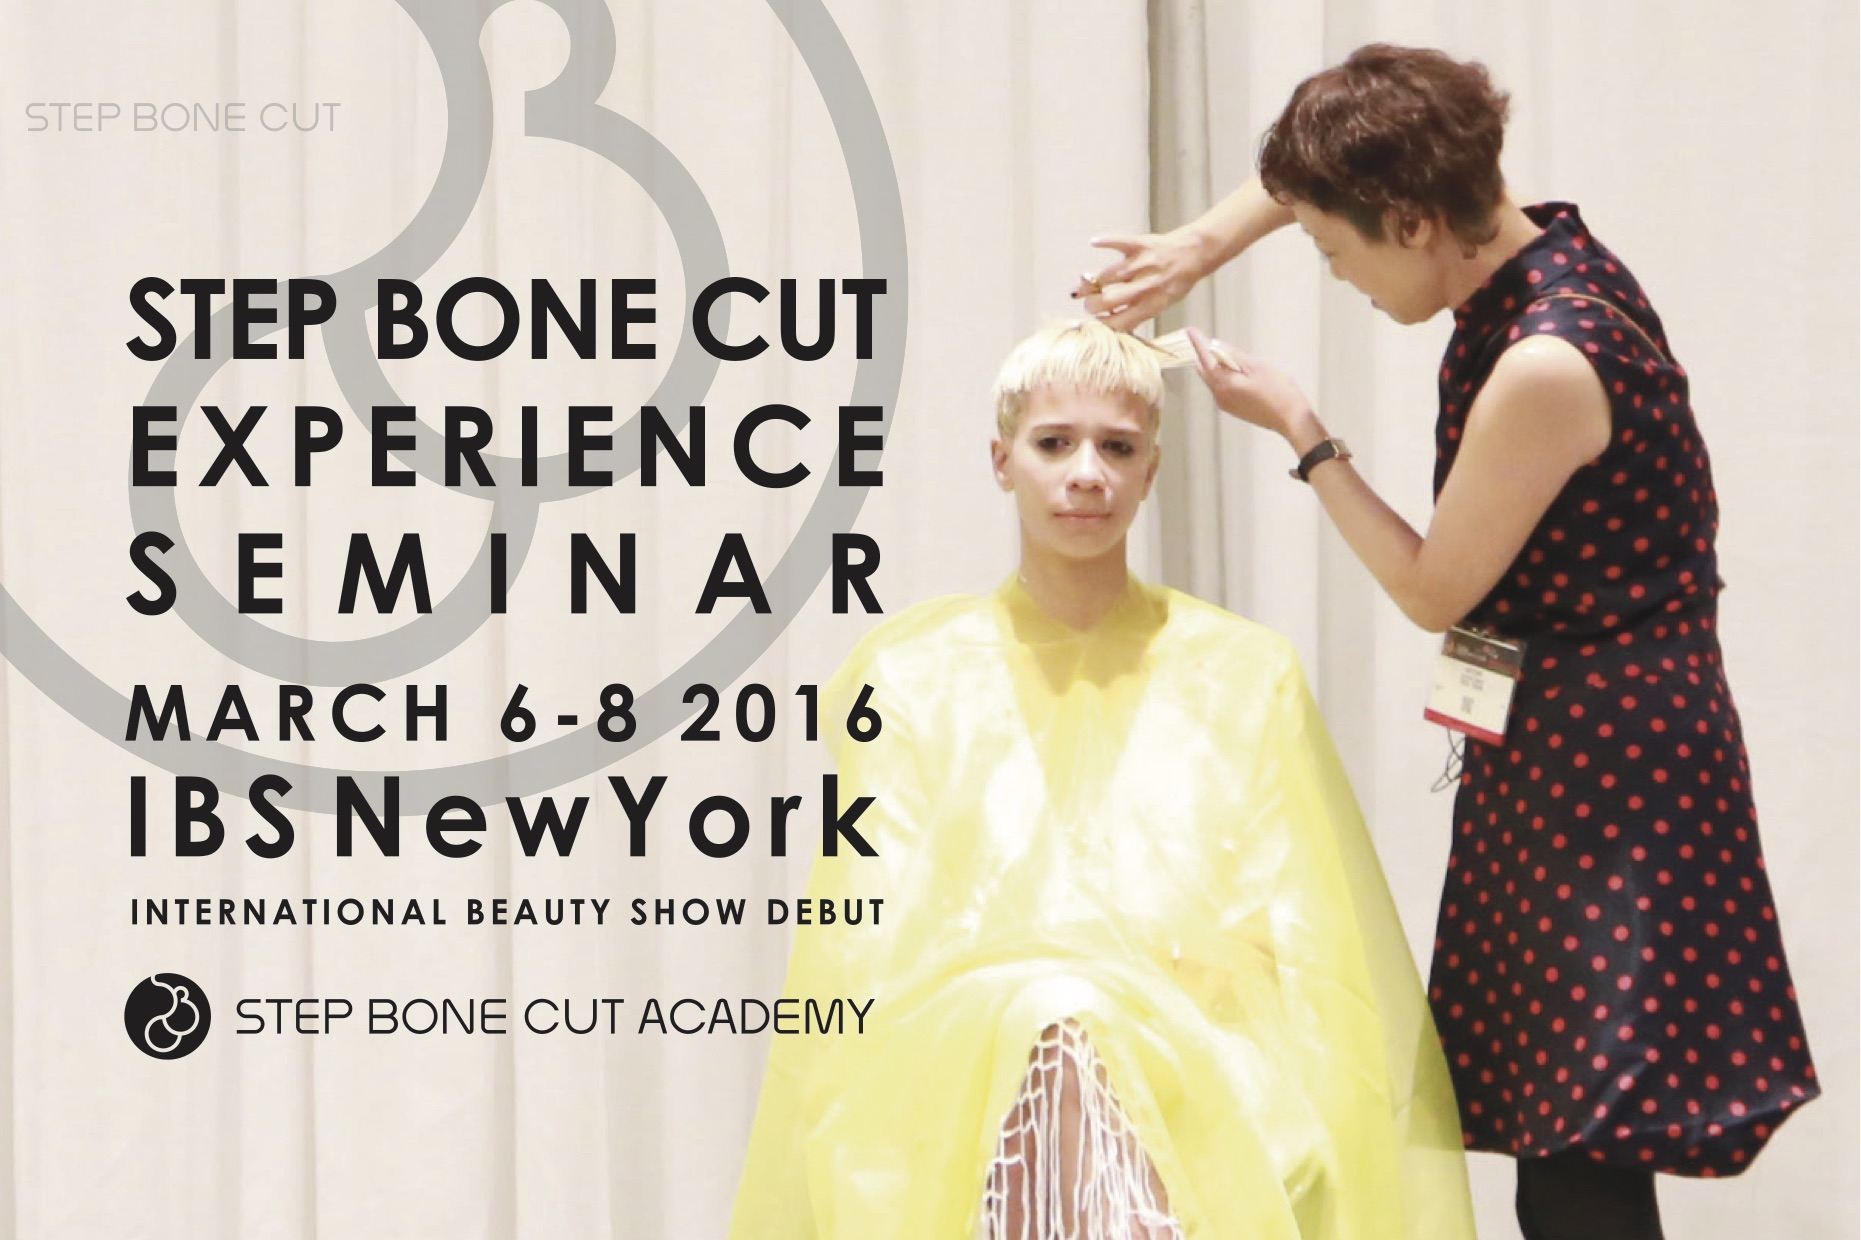 写真:STEP BONE CUT EXPERIENCE SEMINAR IBS NEW YORK  REPORT